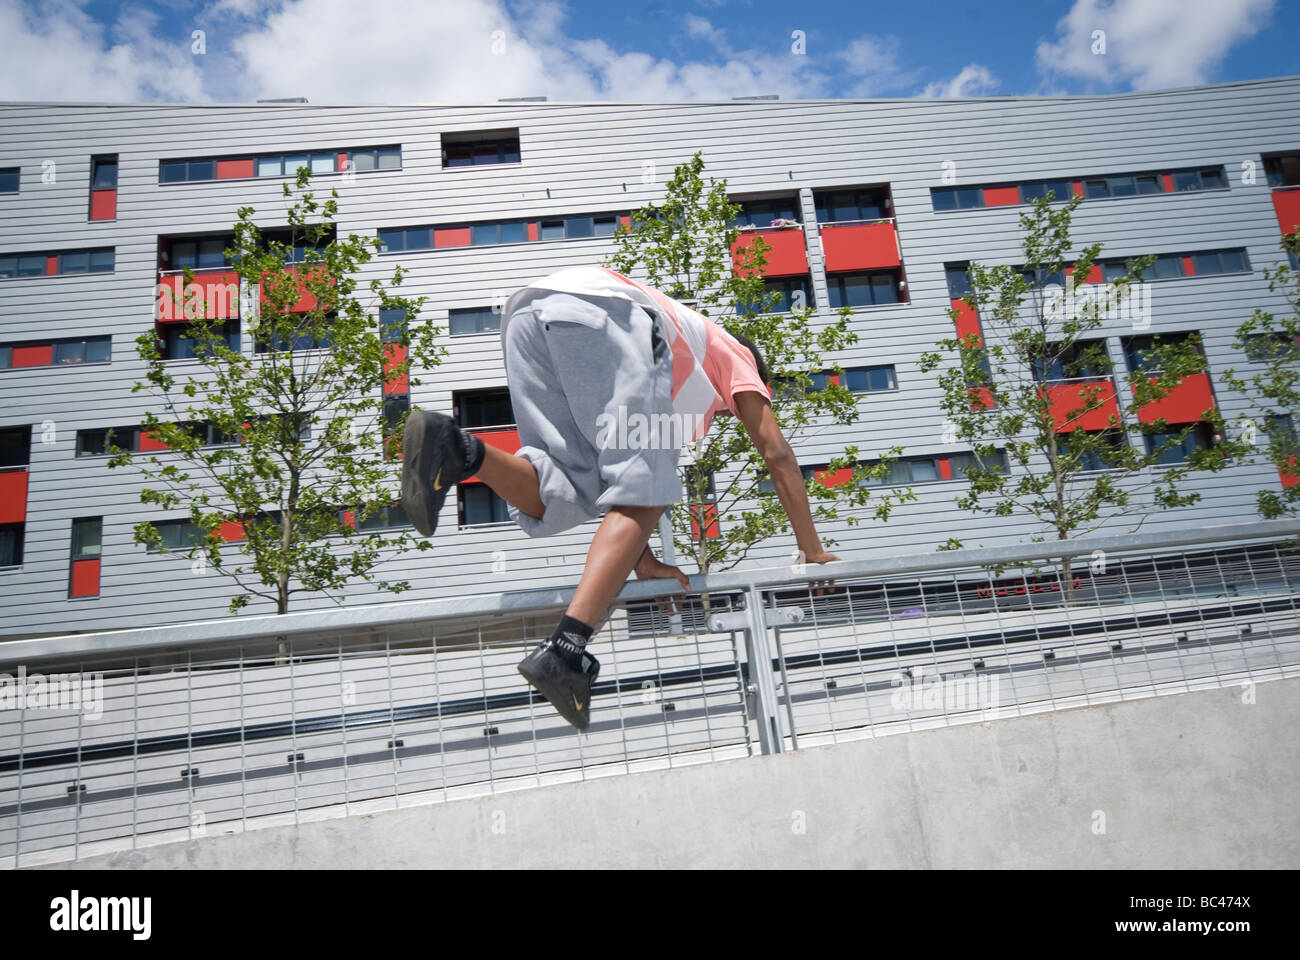 Practicing Parkour at Pro active Event Arsenal Emirates Stadium London - Stock Image